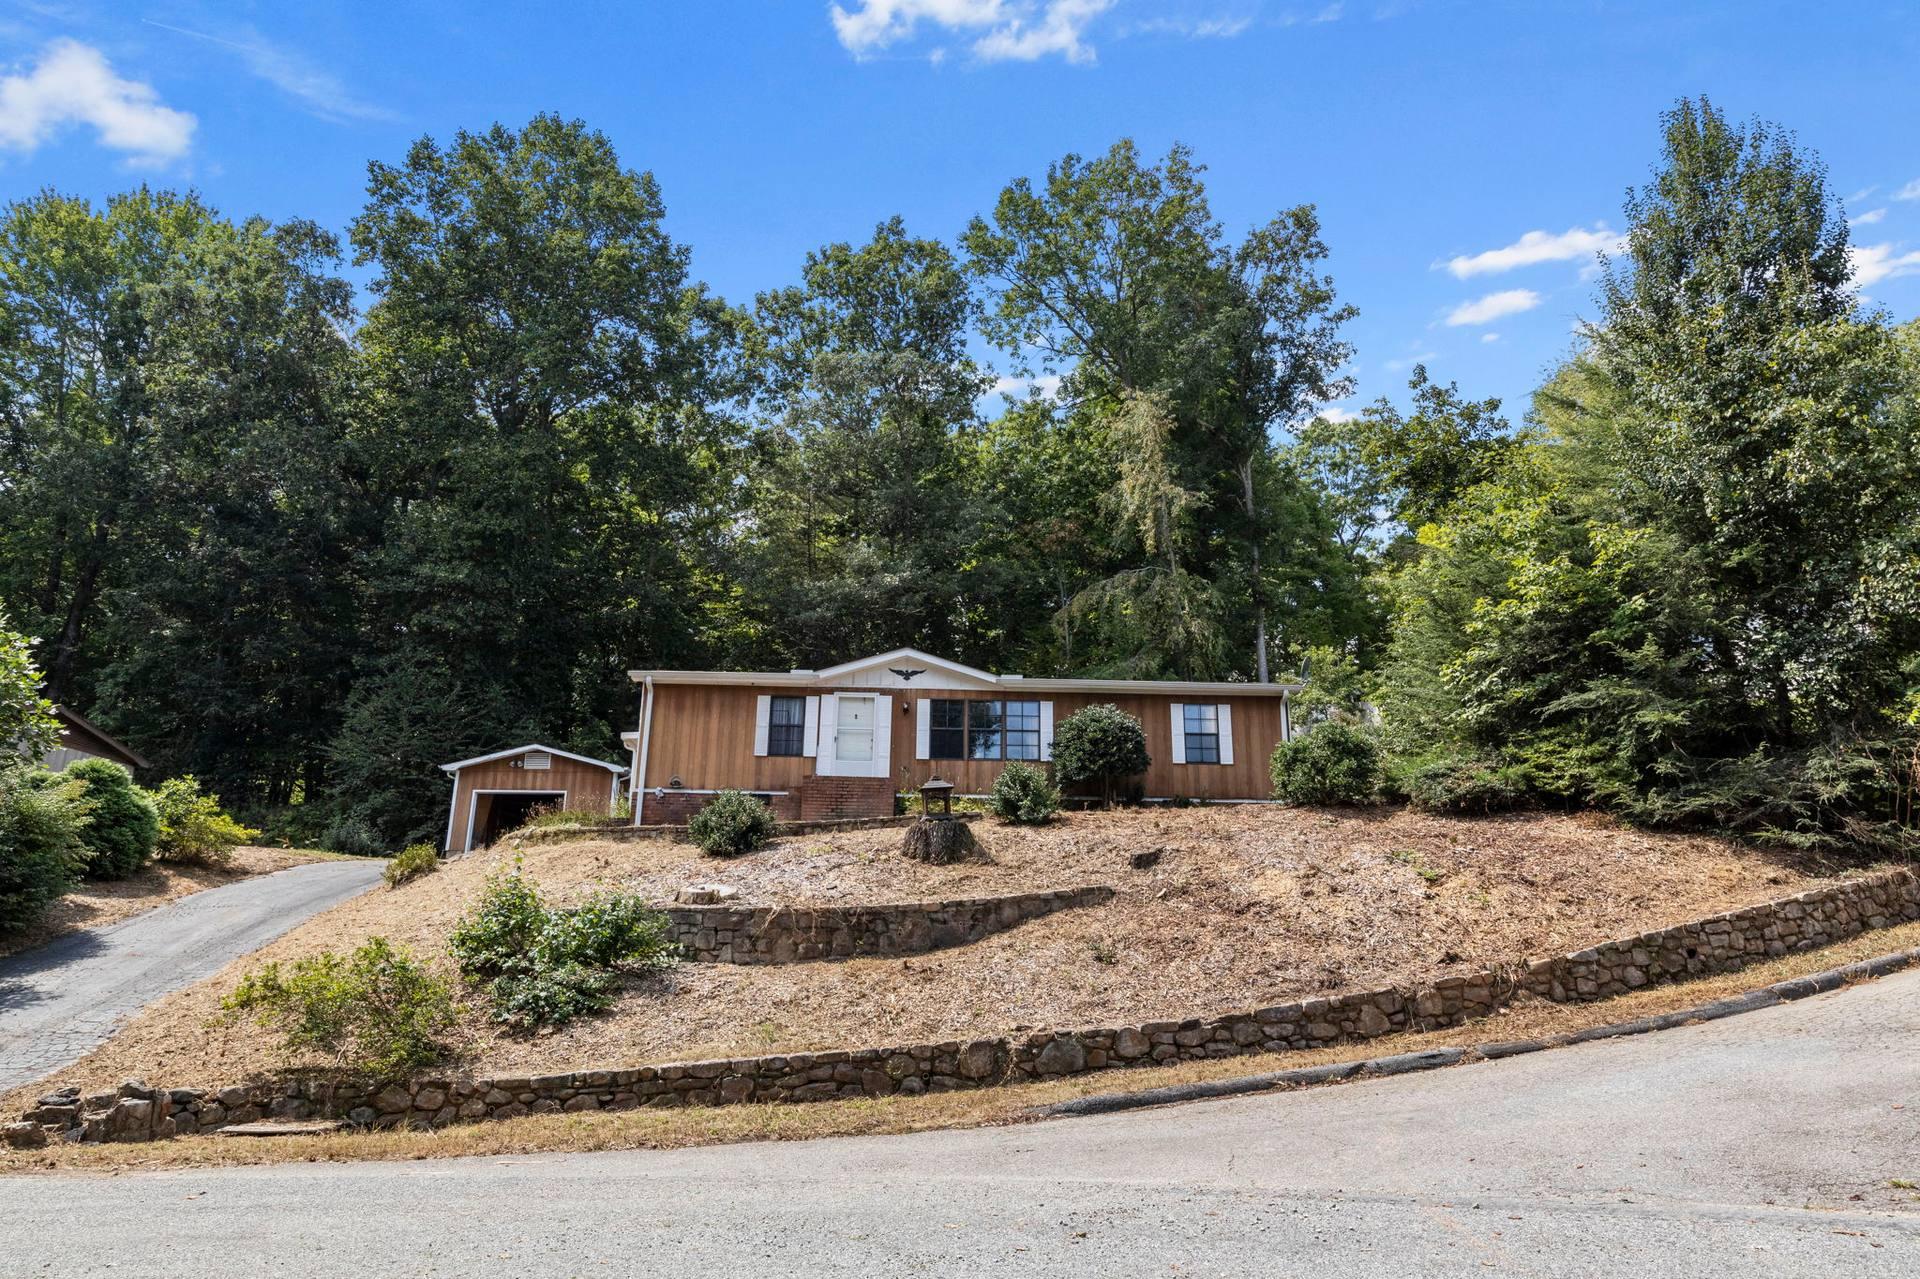 36 Woodscape Dr, Mills River, NC 28759, USA